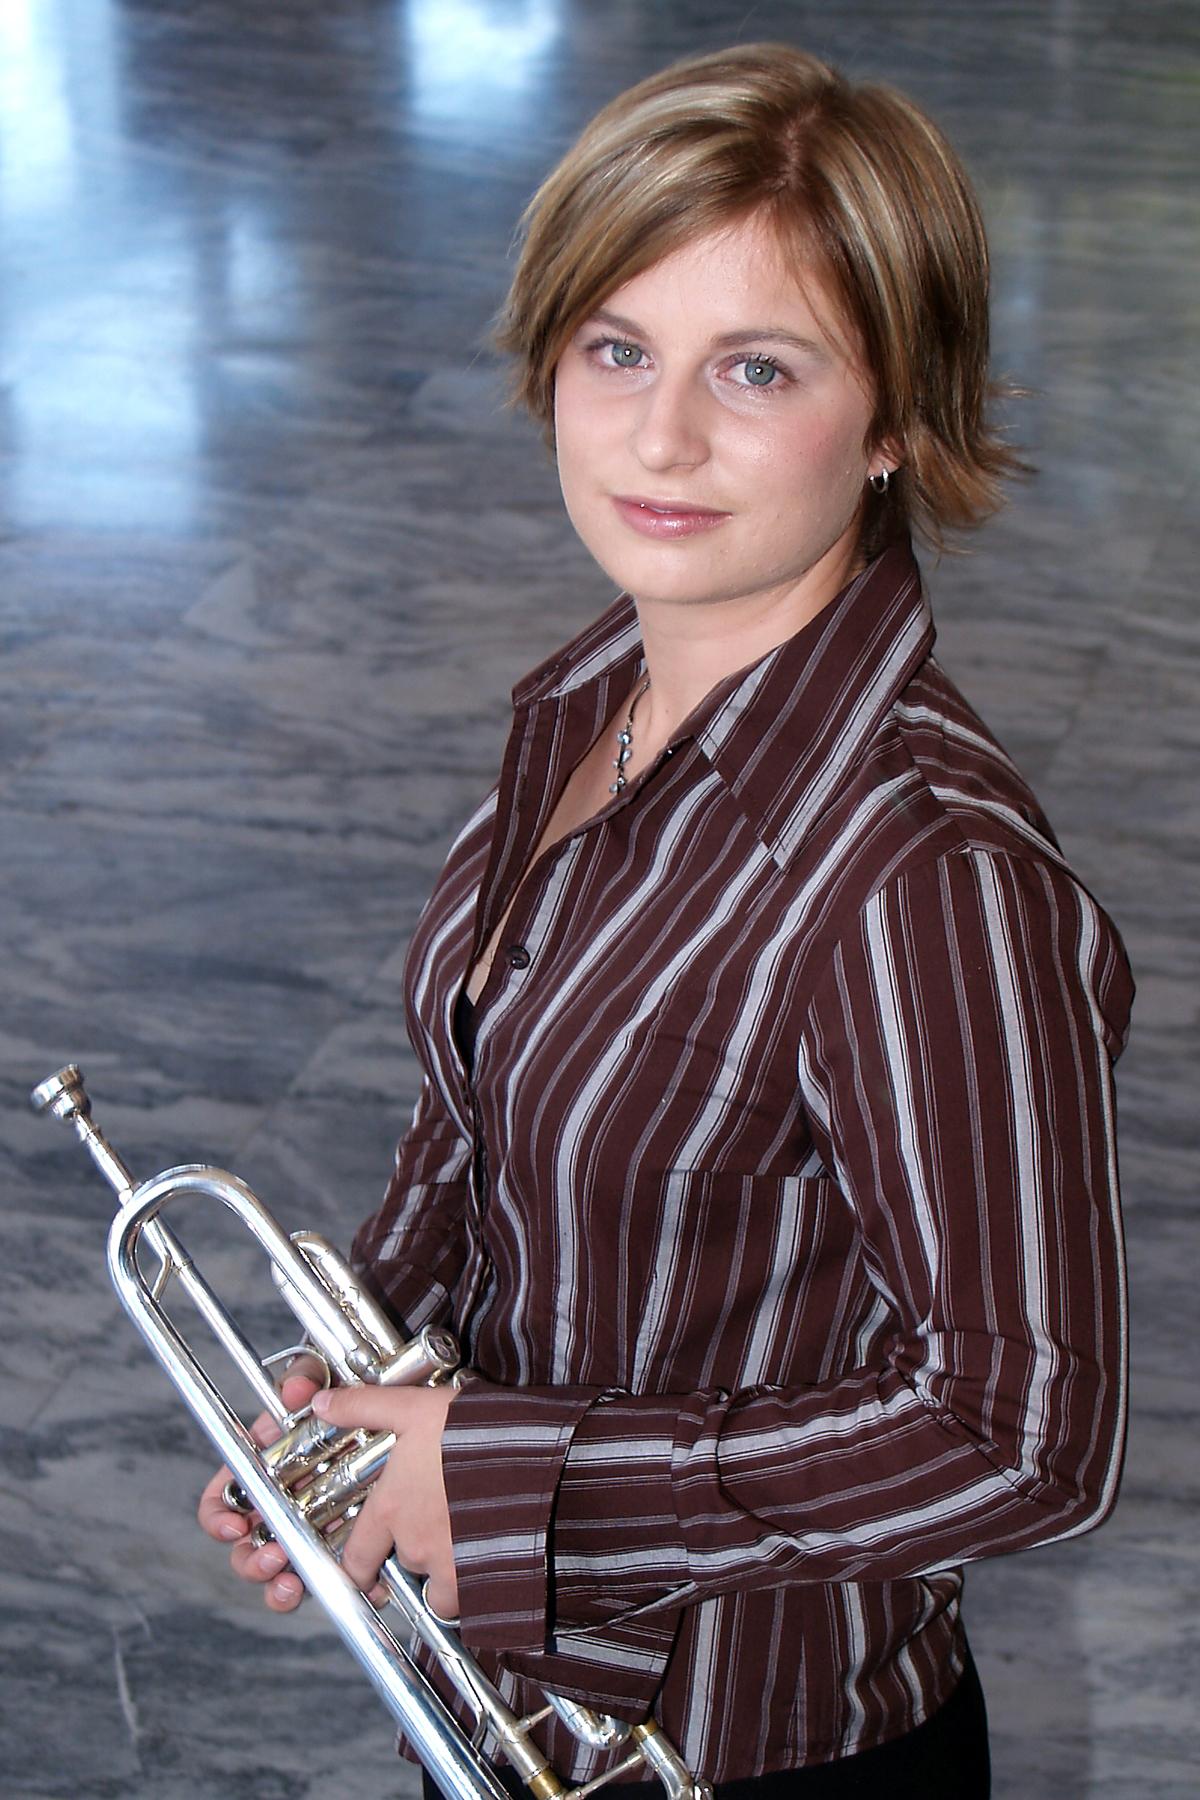 Yvonne-Marié Brand